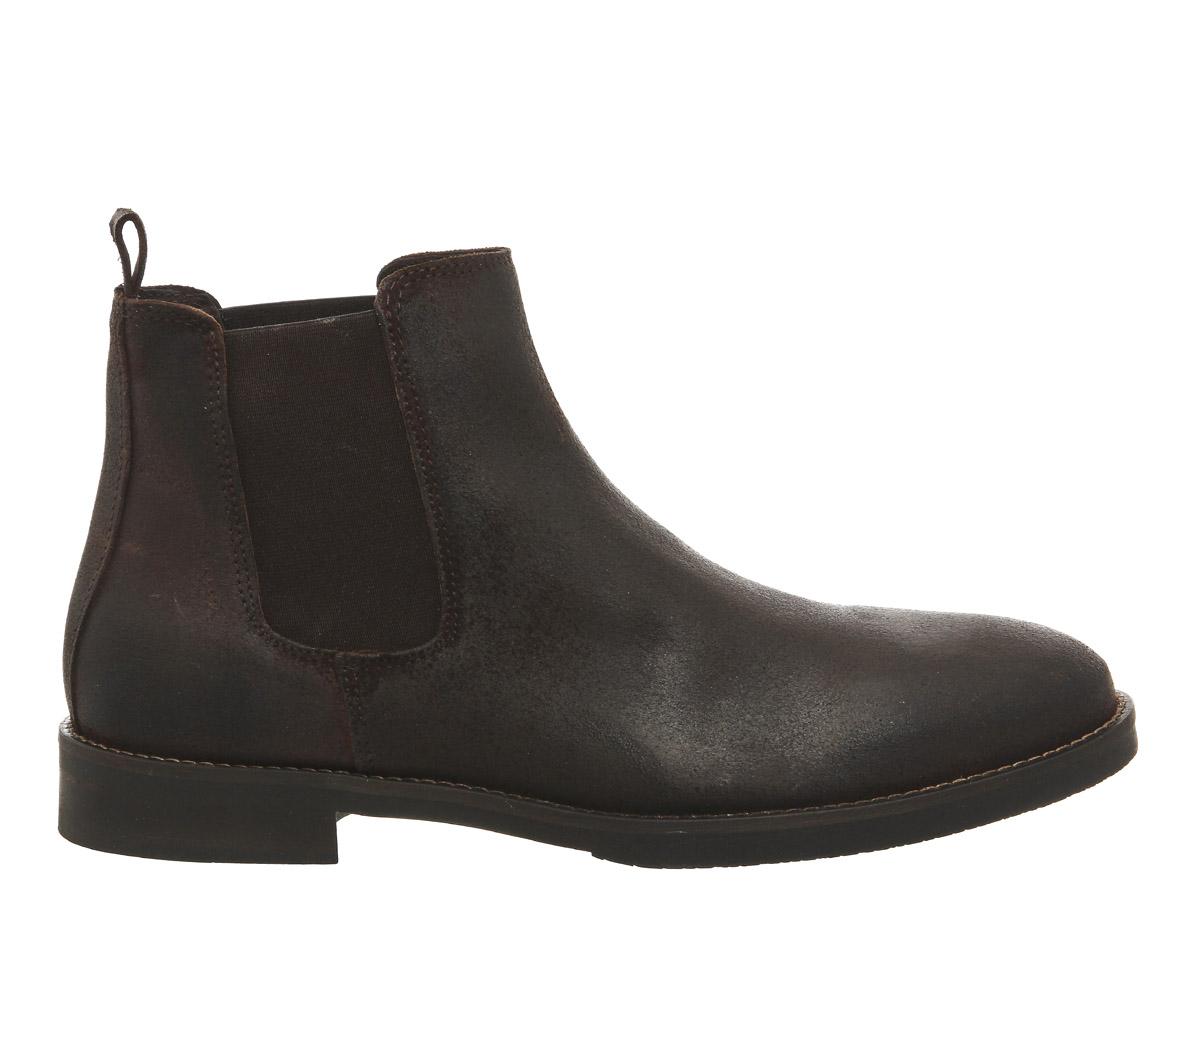 hommes-Office-Cage-bottes-chelsea-marron-cuir-cire-bottes